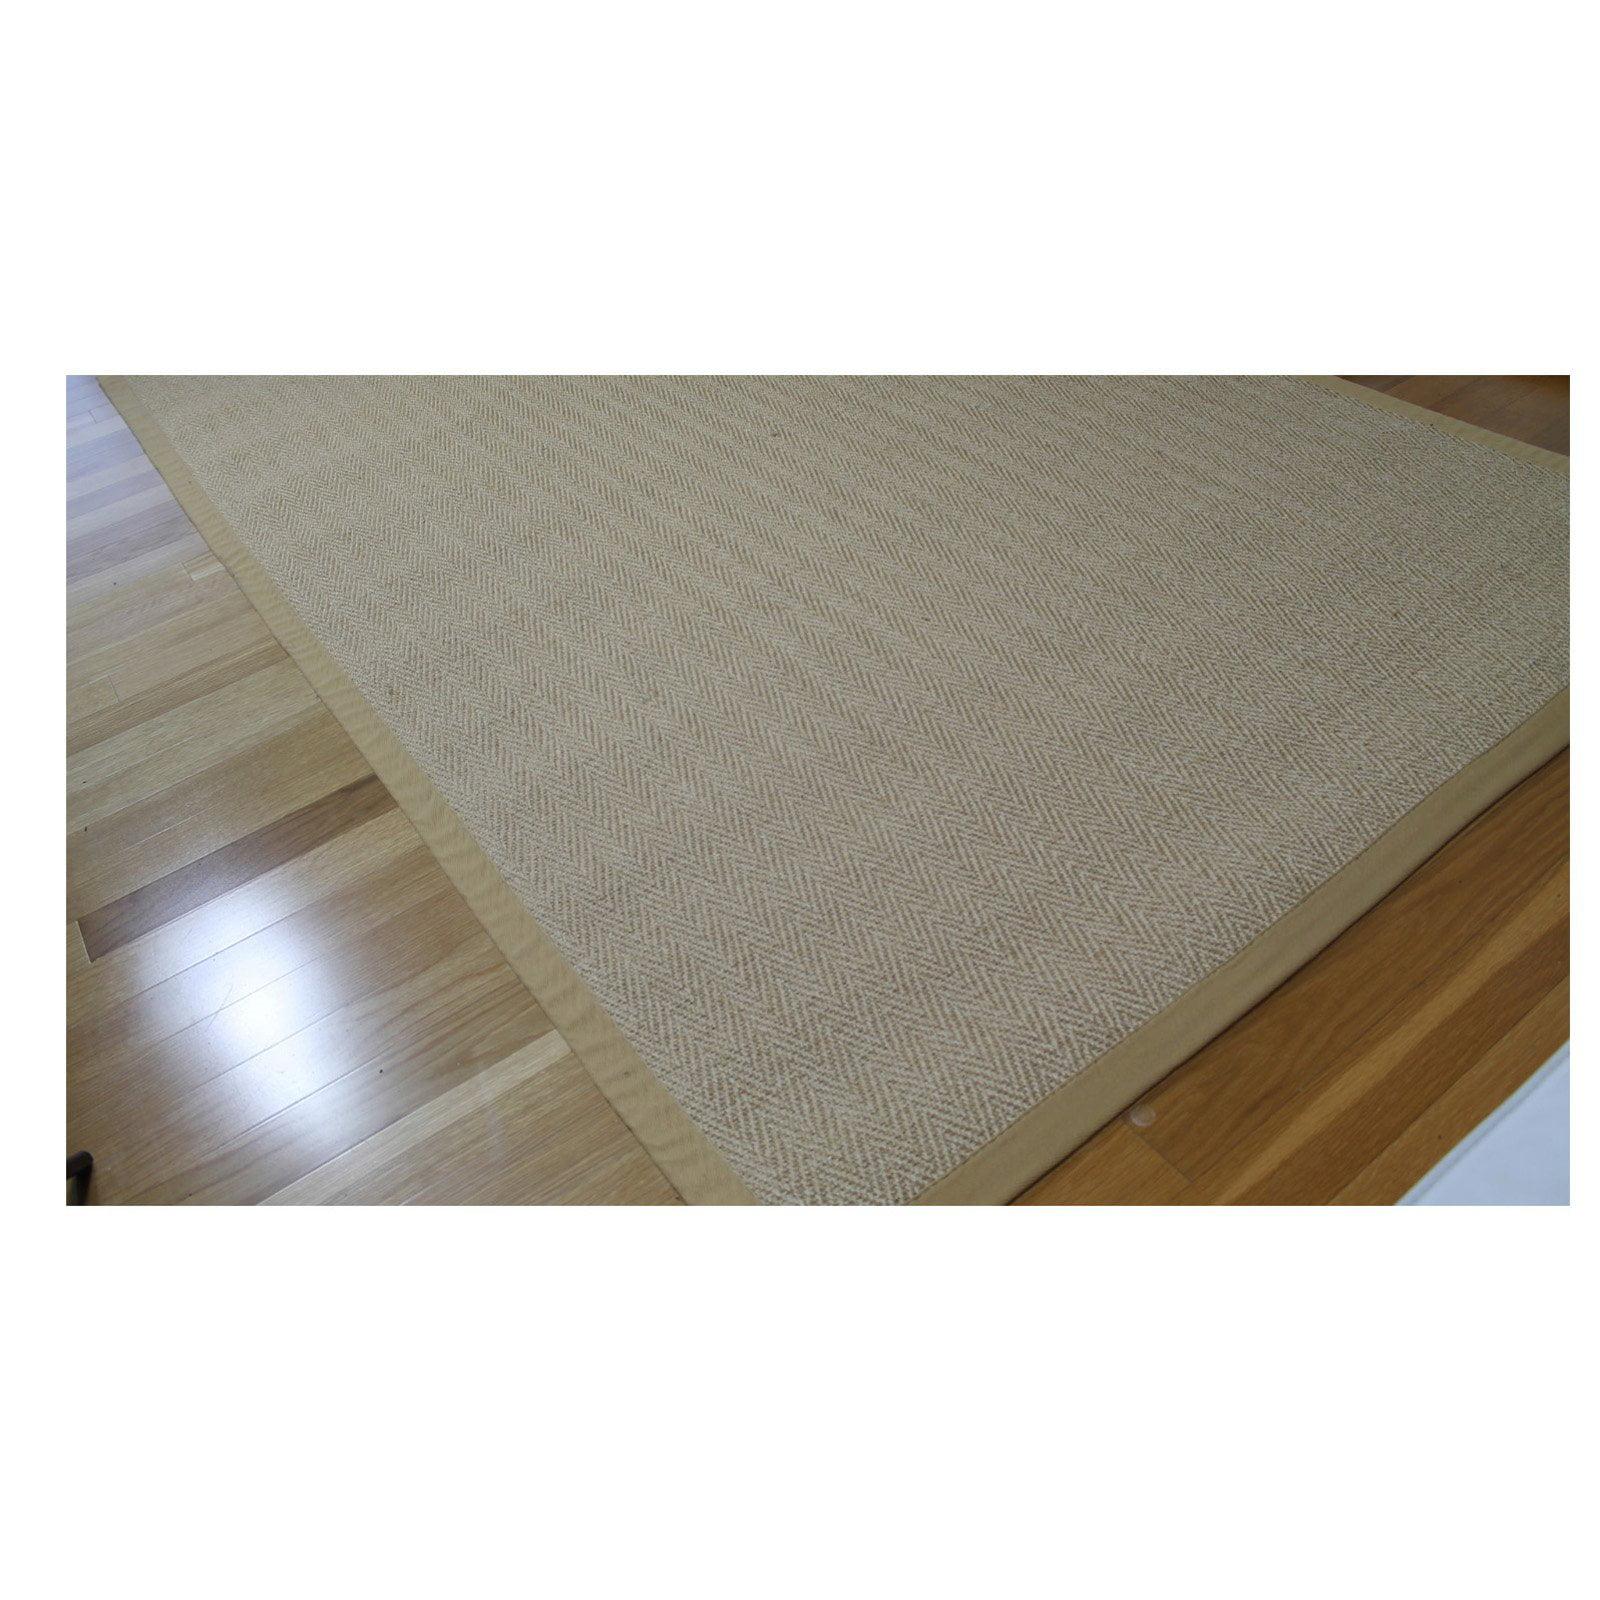 Walmart Foyer Rug : A hc sisal rug natural fiber area non skid latex